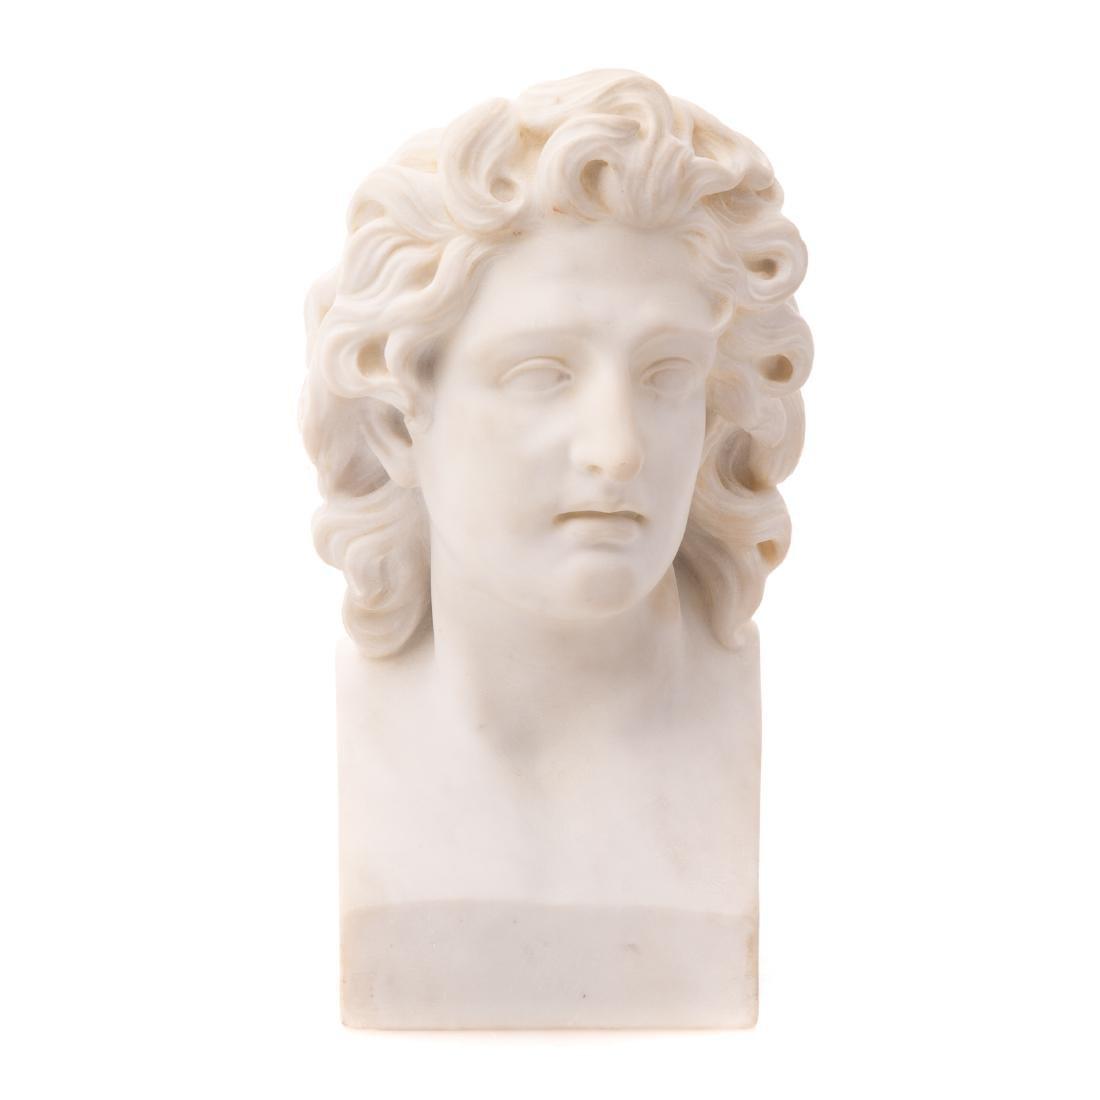 Italian Grande Tour marble bust of Apollo